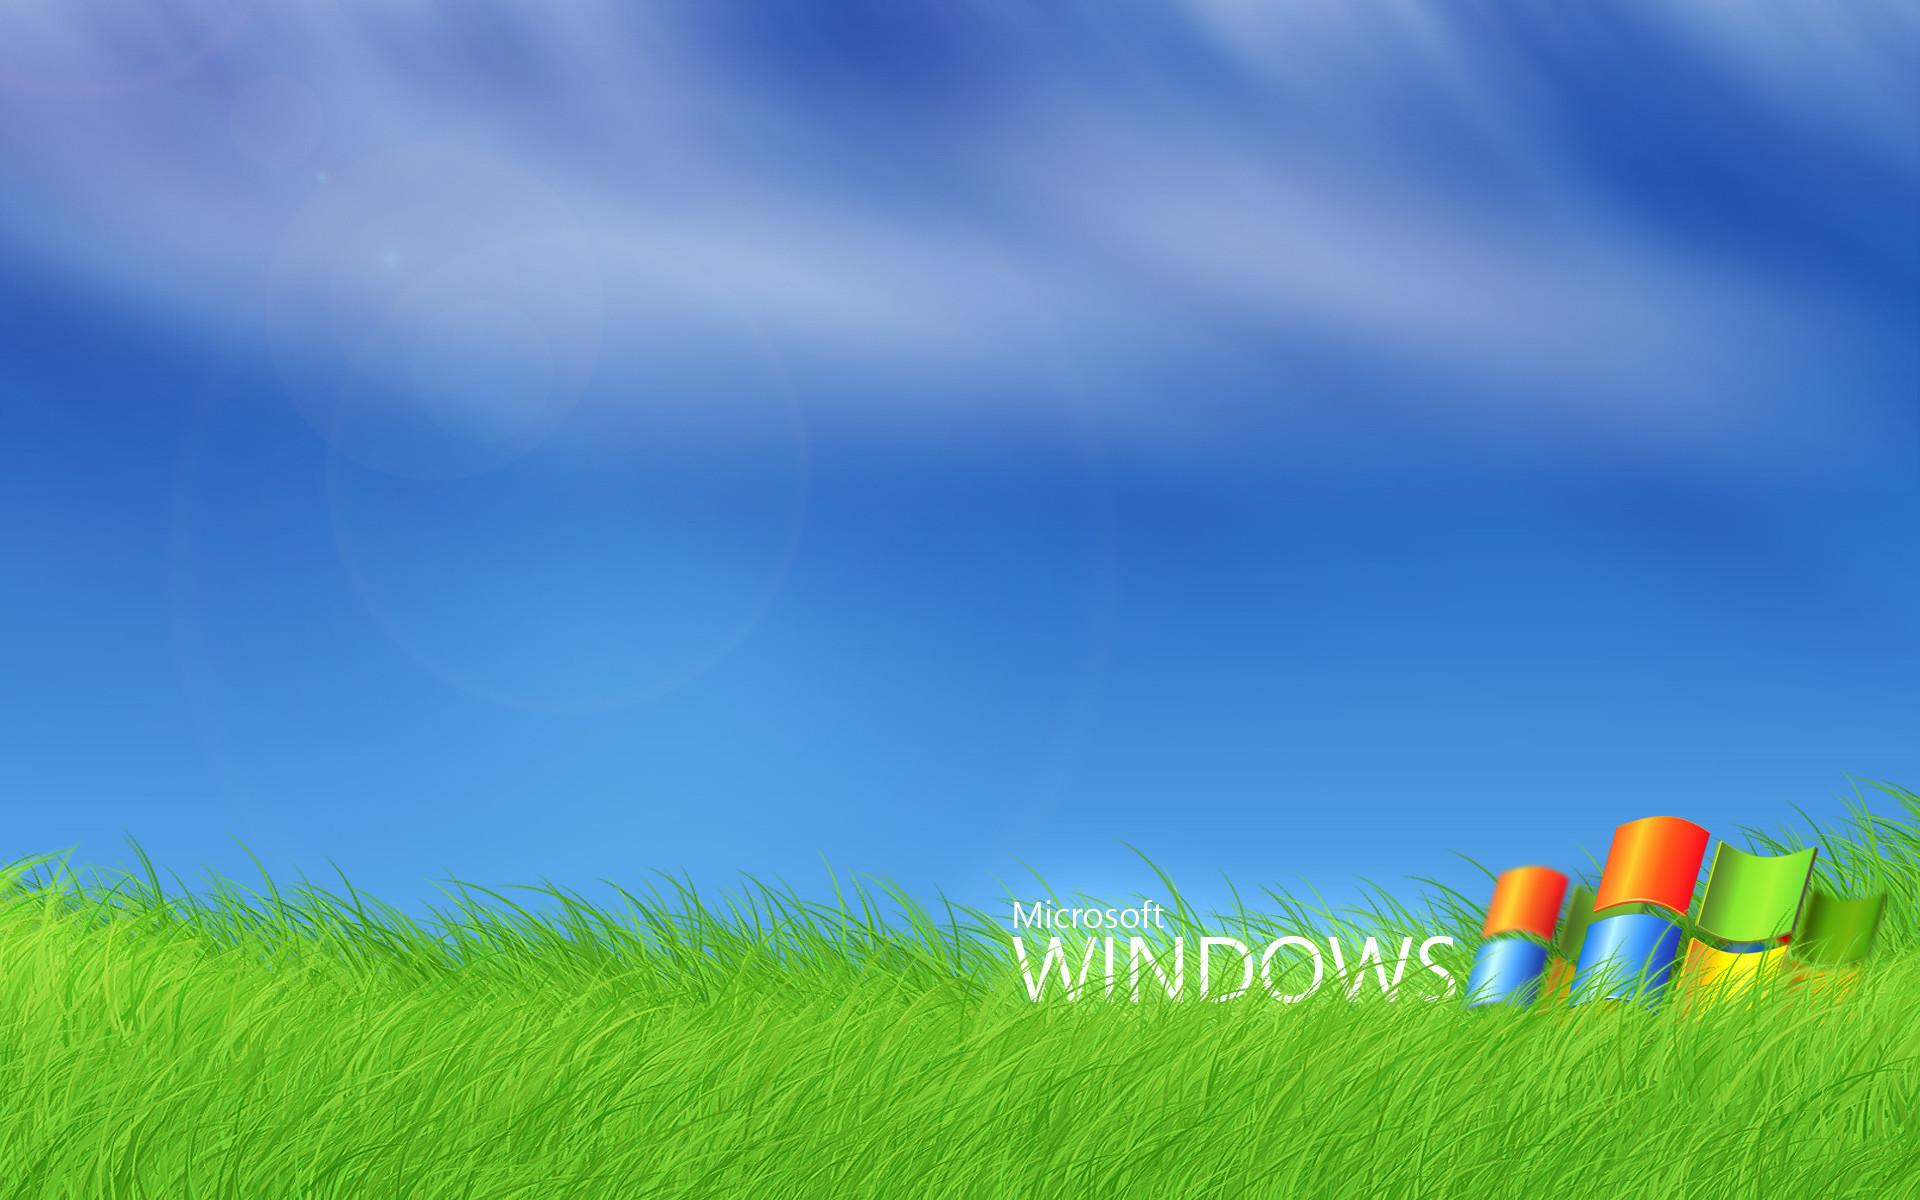 Animated Desktop Wallpaper Windows 7 47 Images